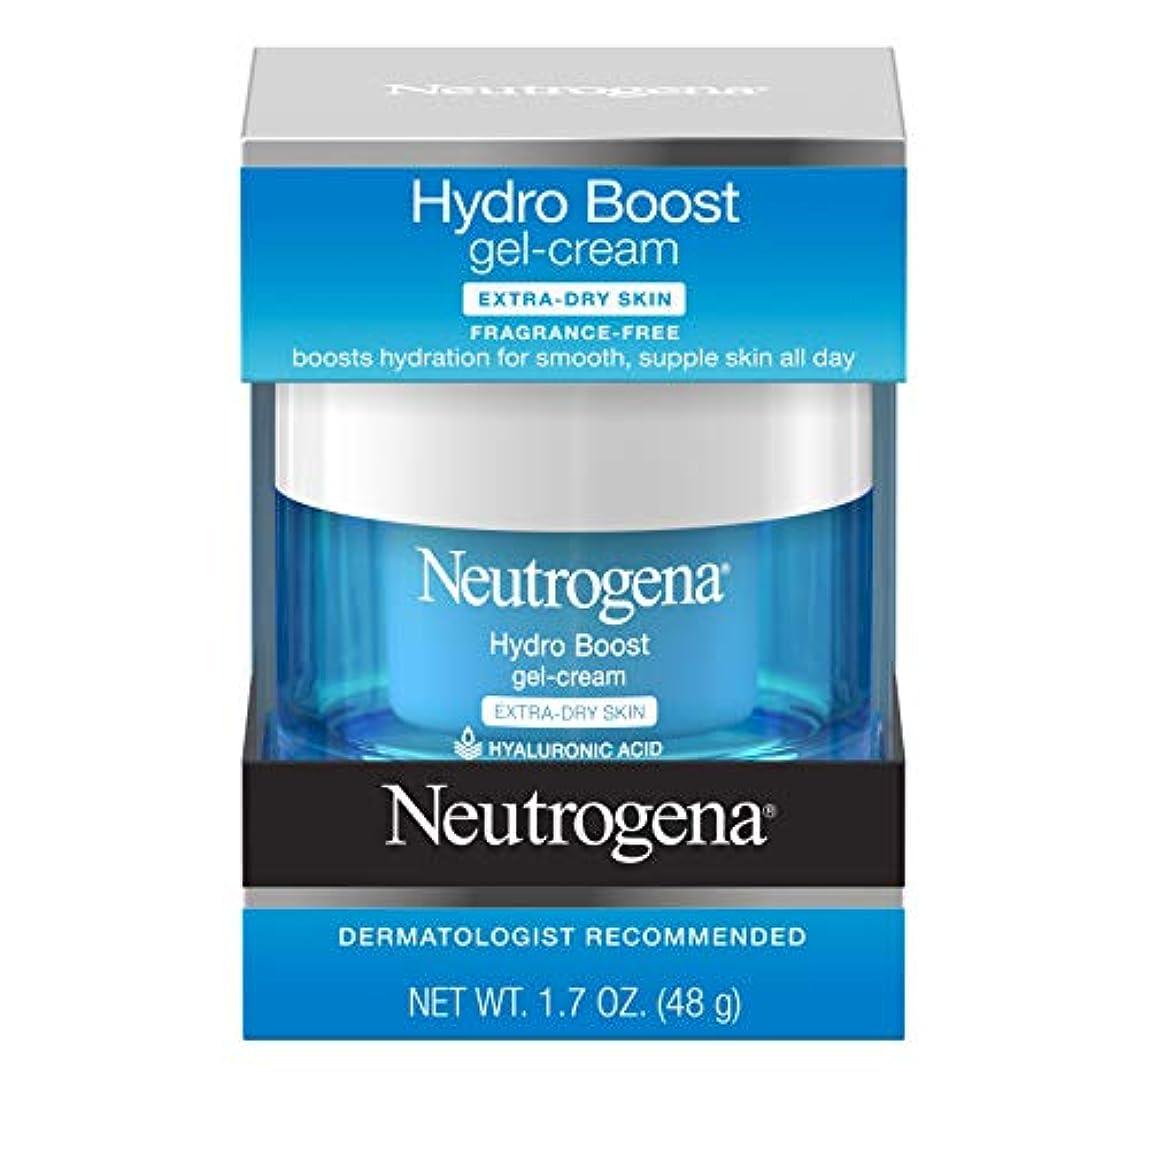 Neutrogena Hydro Boost Gel Cream, Extra Dry Skin, 1.7 Ounce  海外直送品?並行輸入品